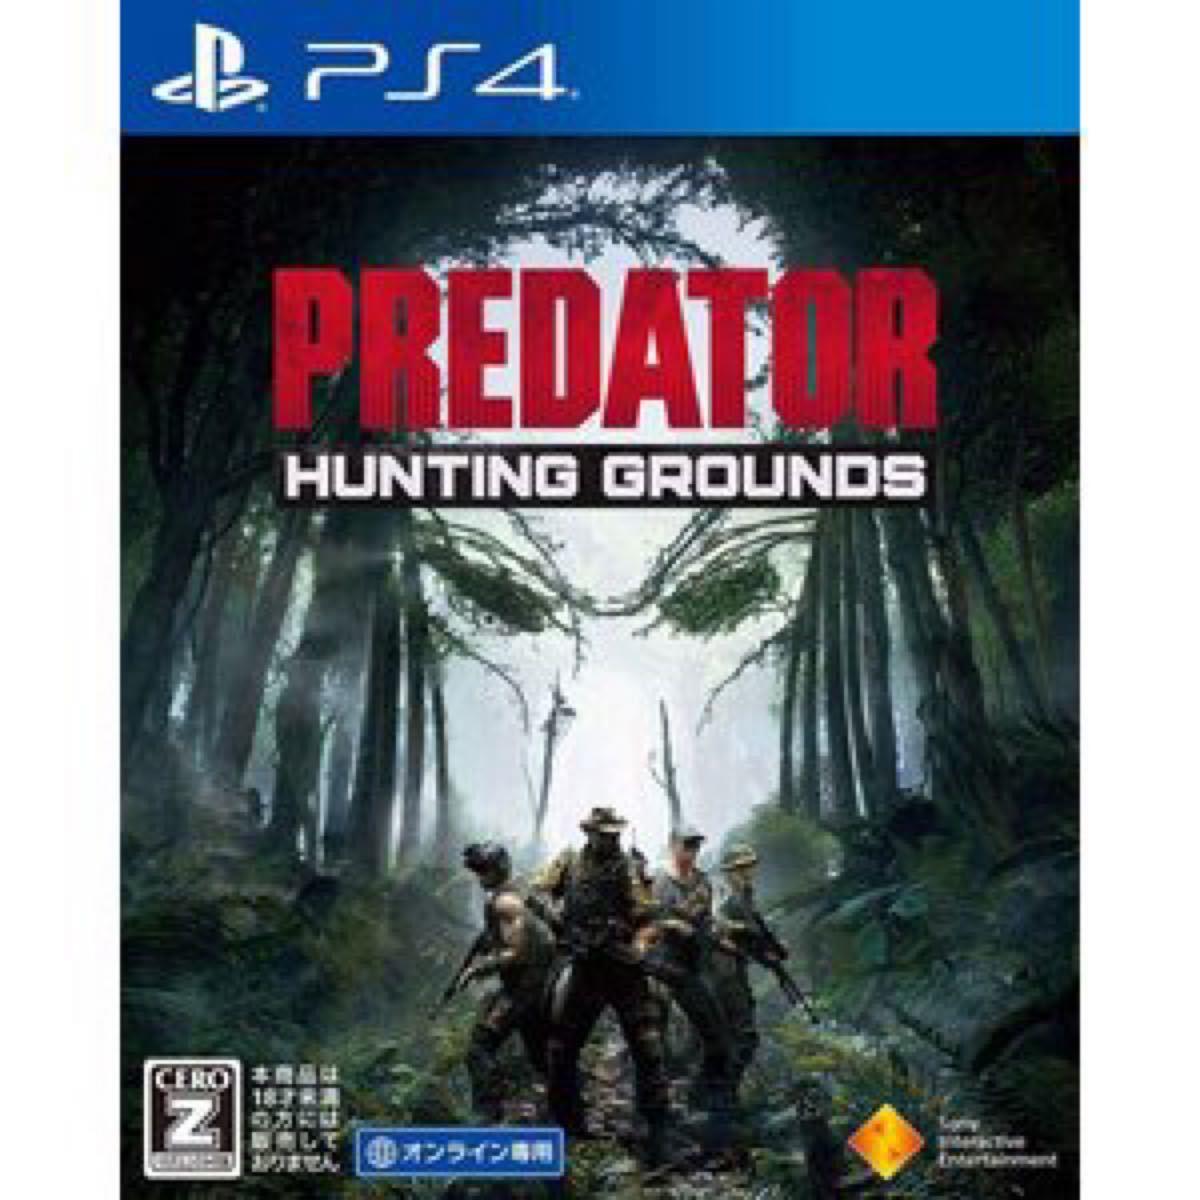 PS4 predator